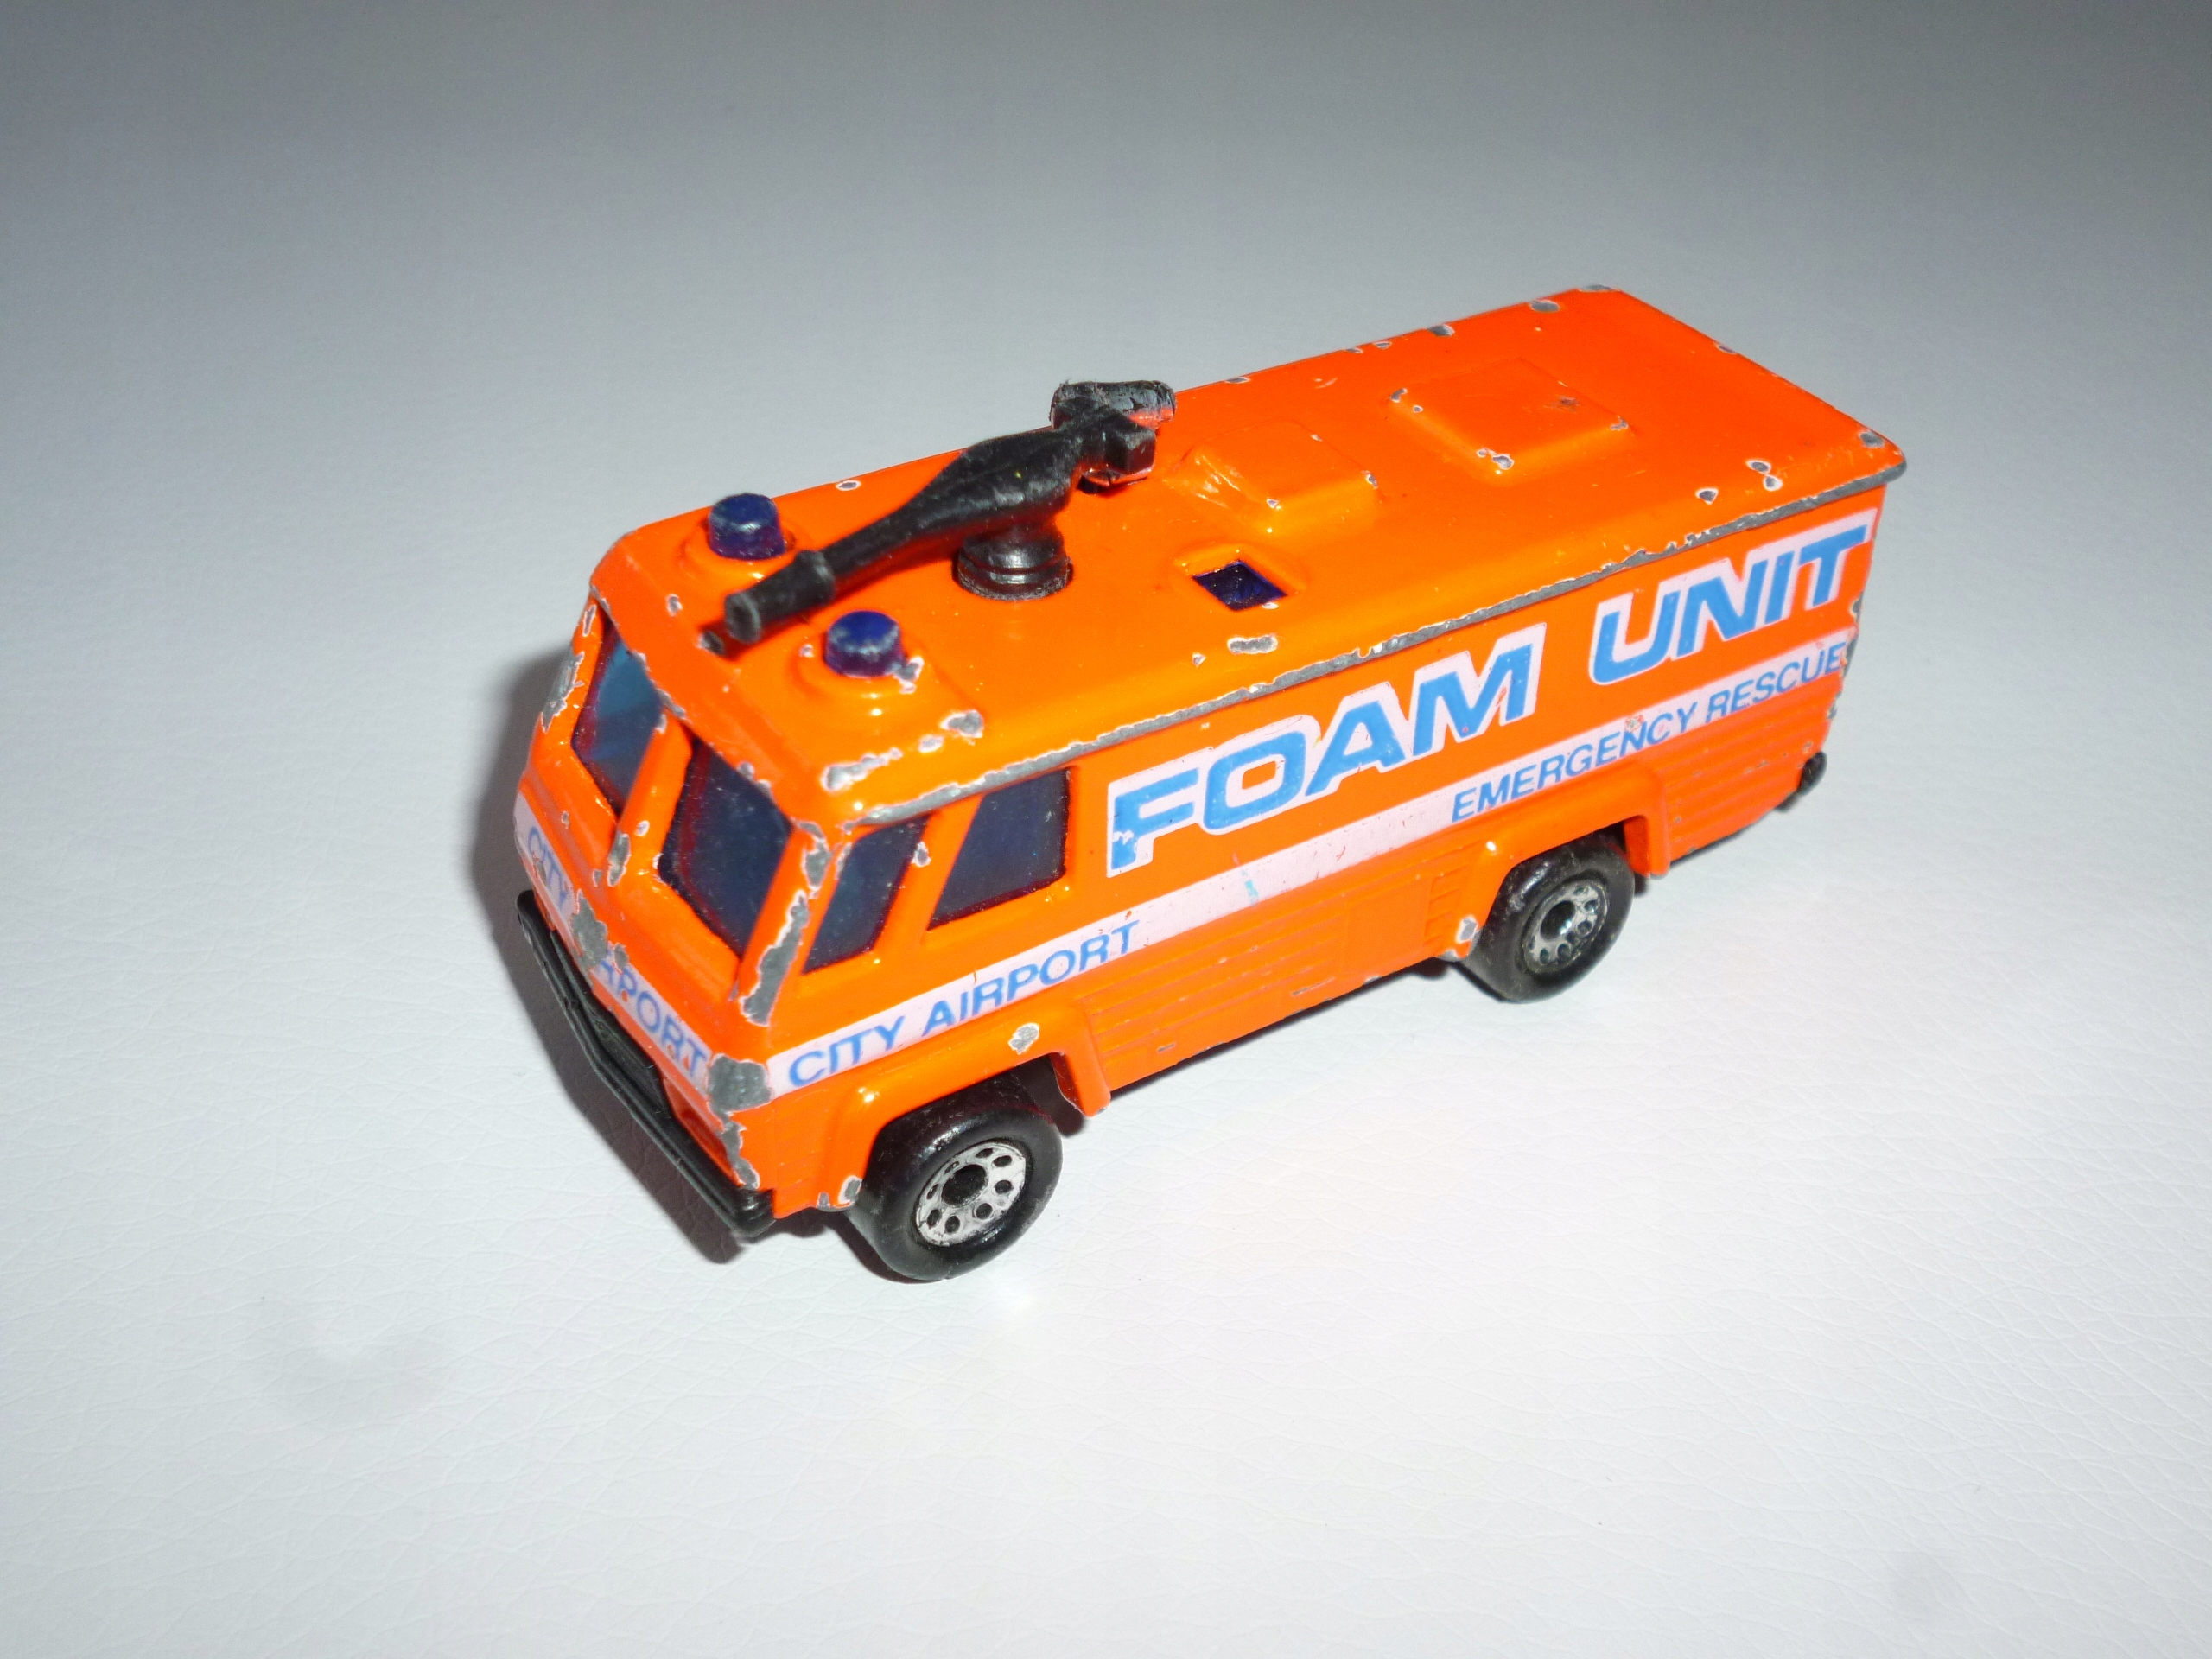 Command Vehicle 1980 Matchbox model resorak autko